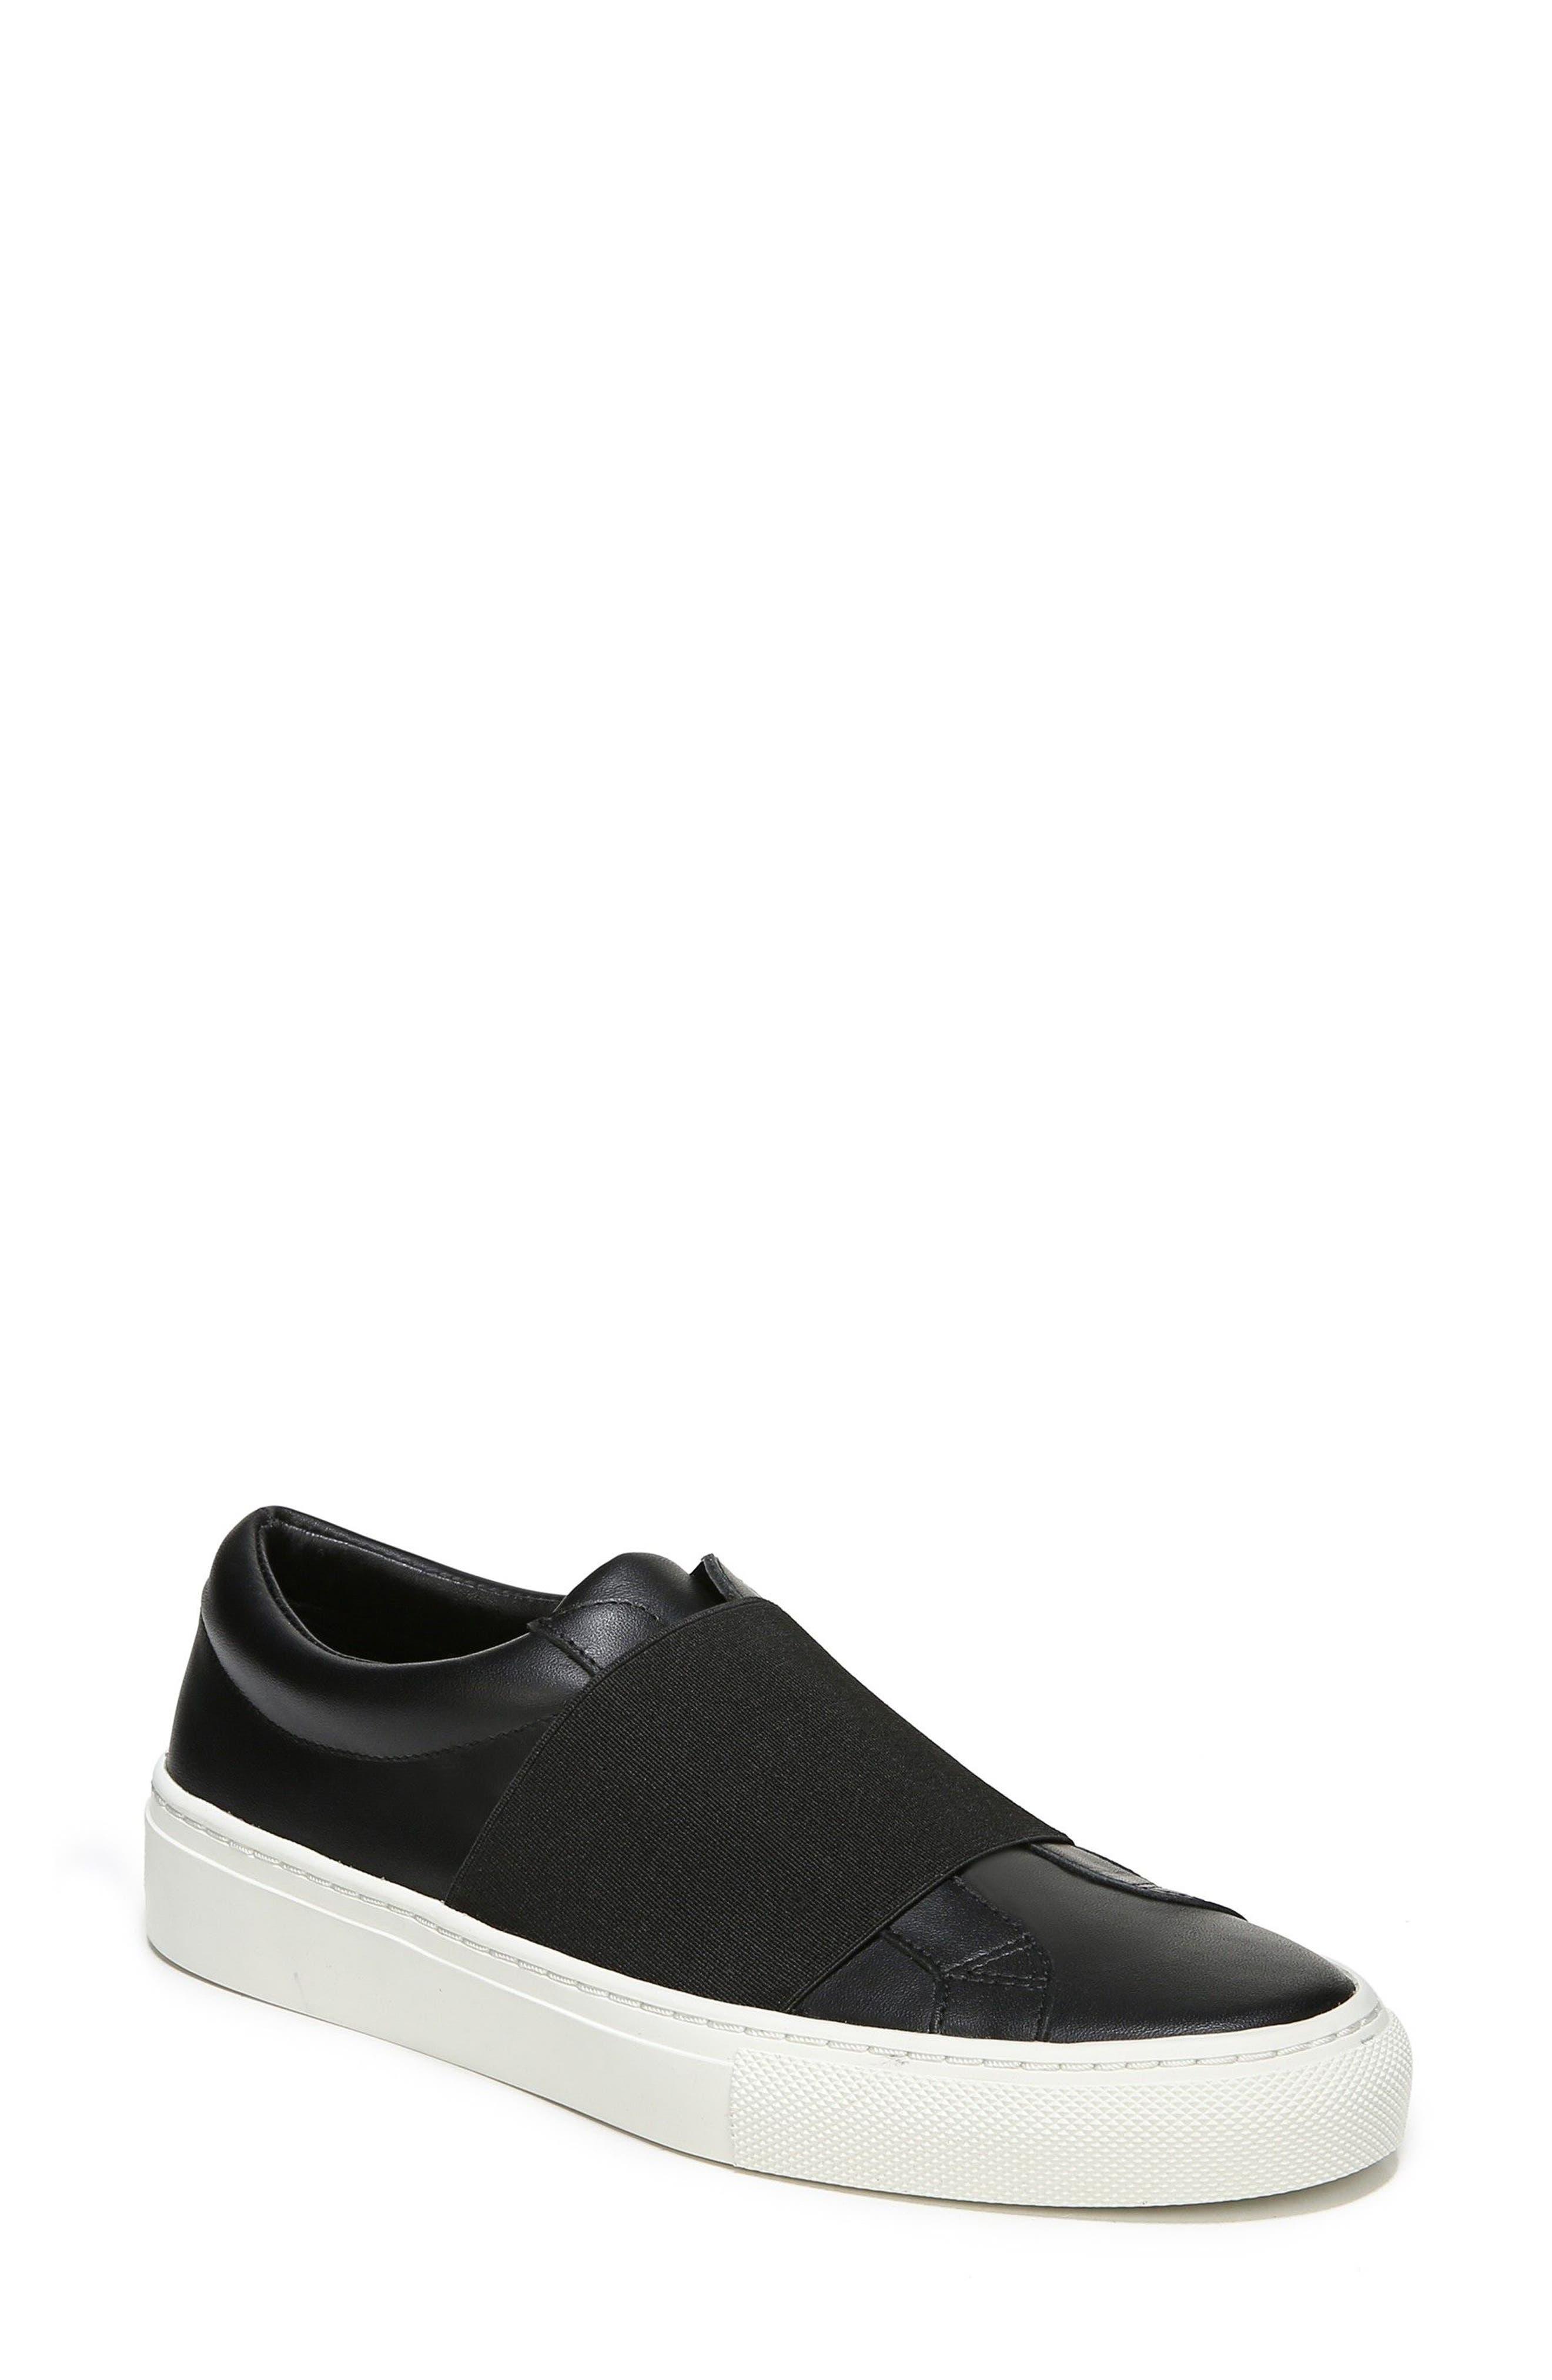 Saran Slip-On Sneaker,                         Main,                         color, Black/ Black Leather